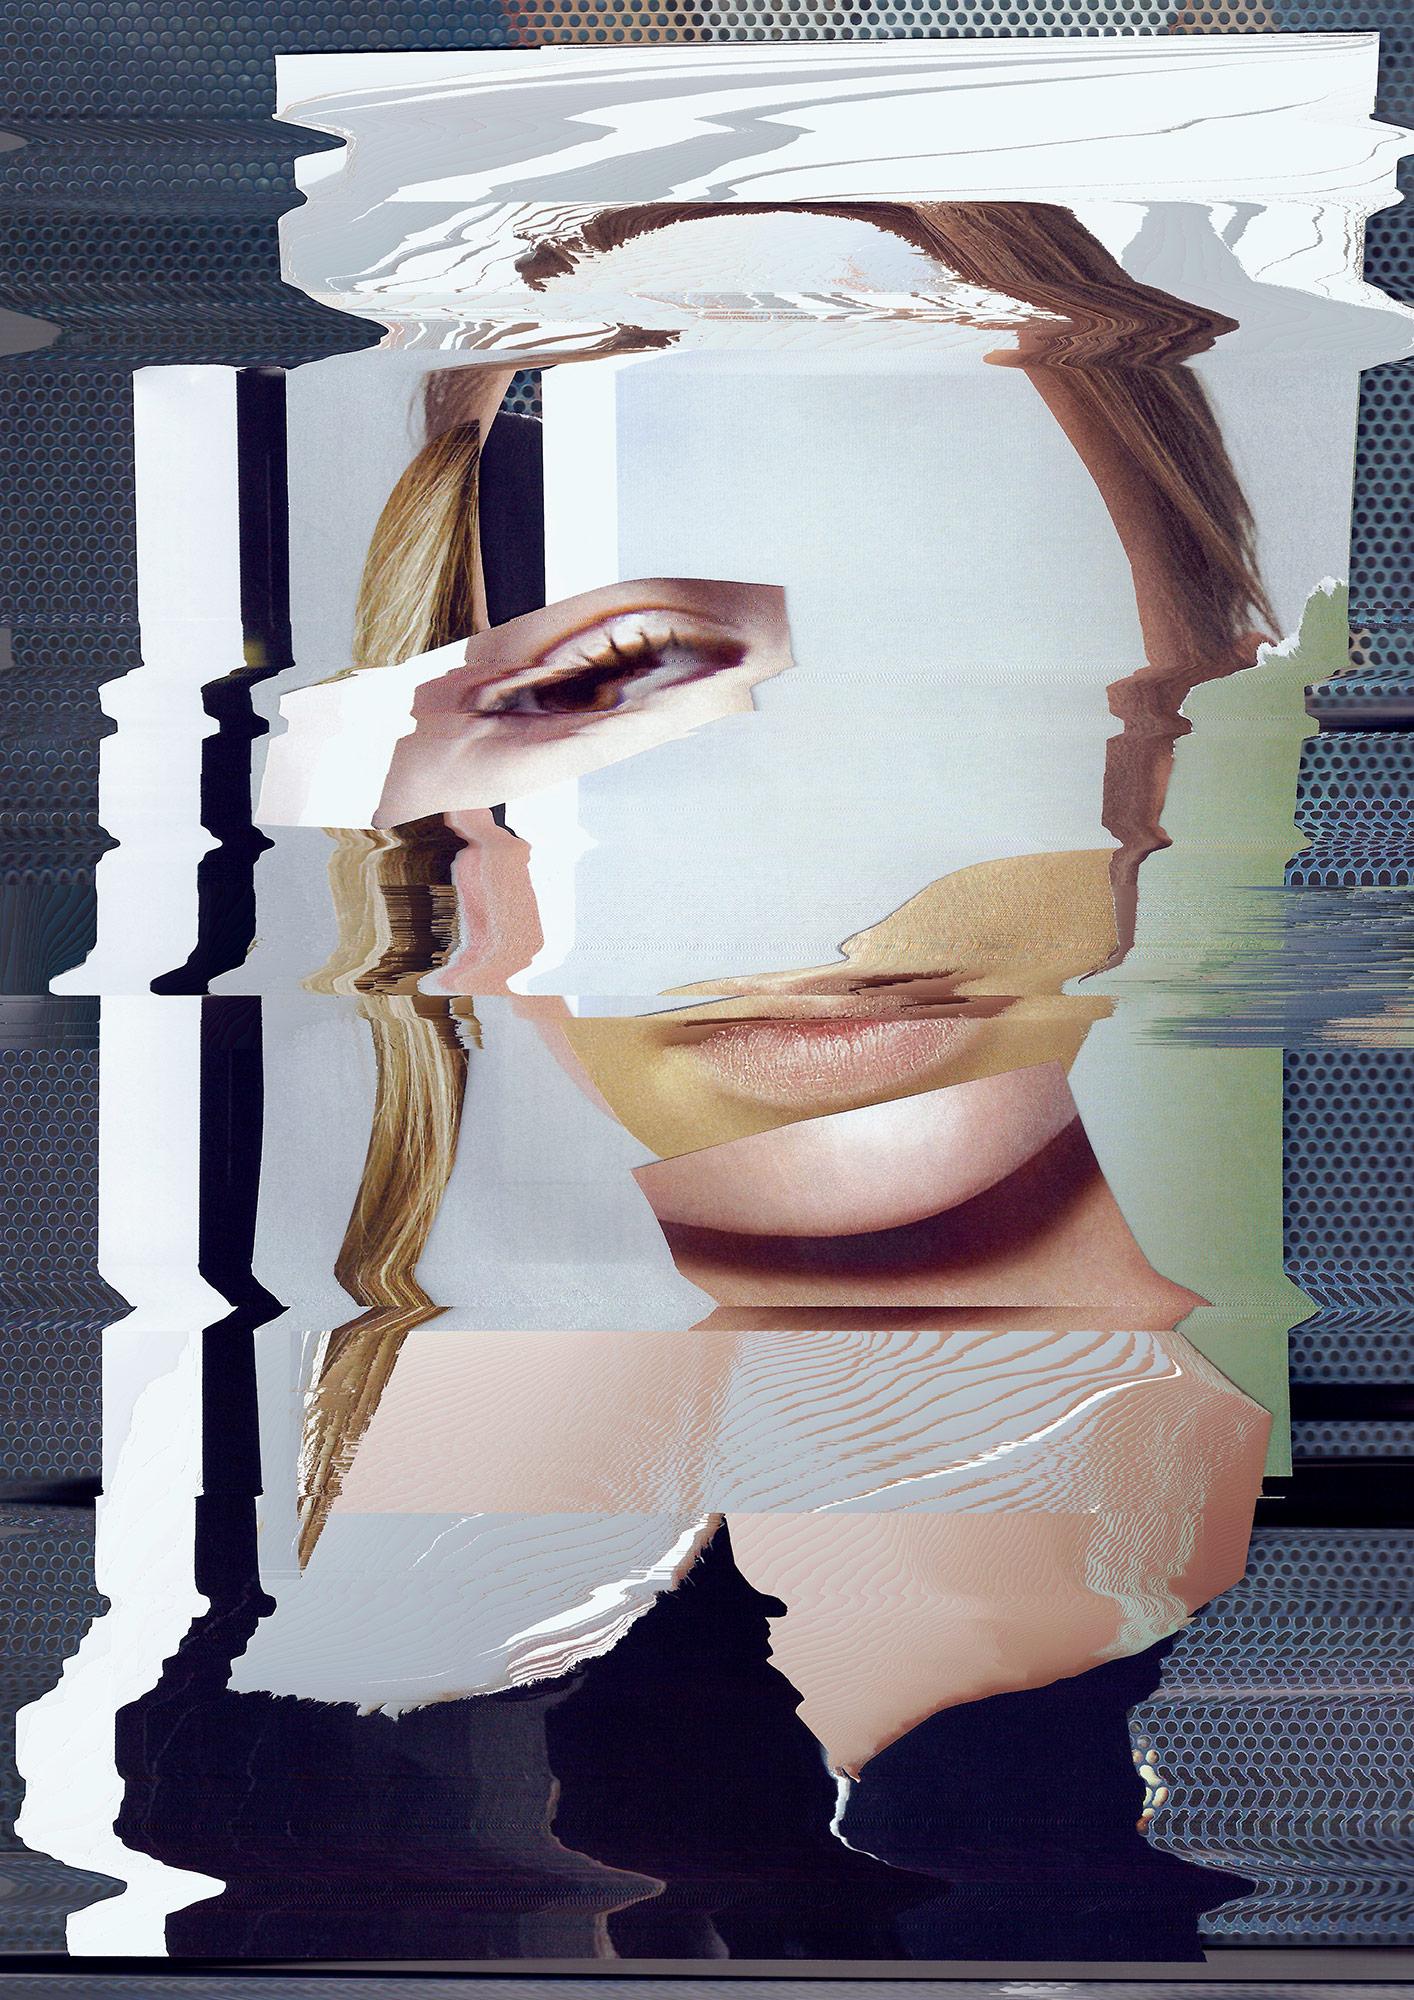 Ewa Doroszenko - Radical Beauty 08, photography